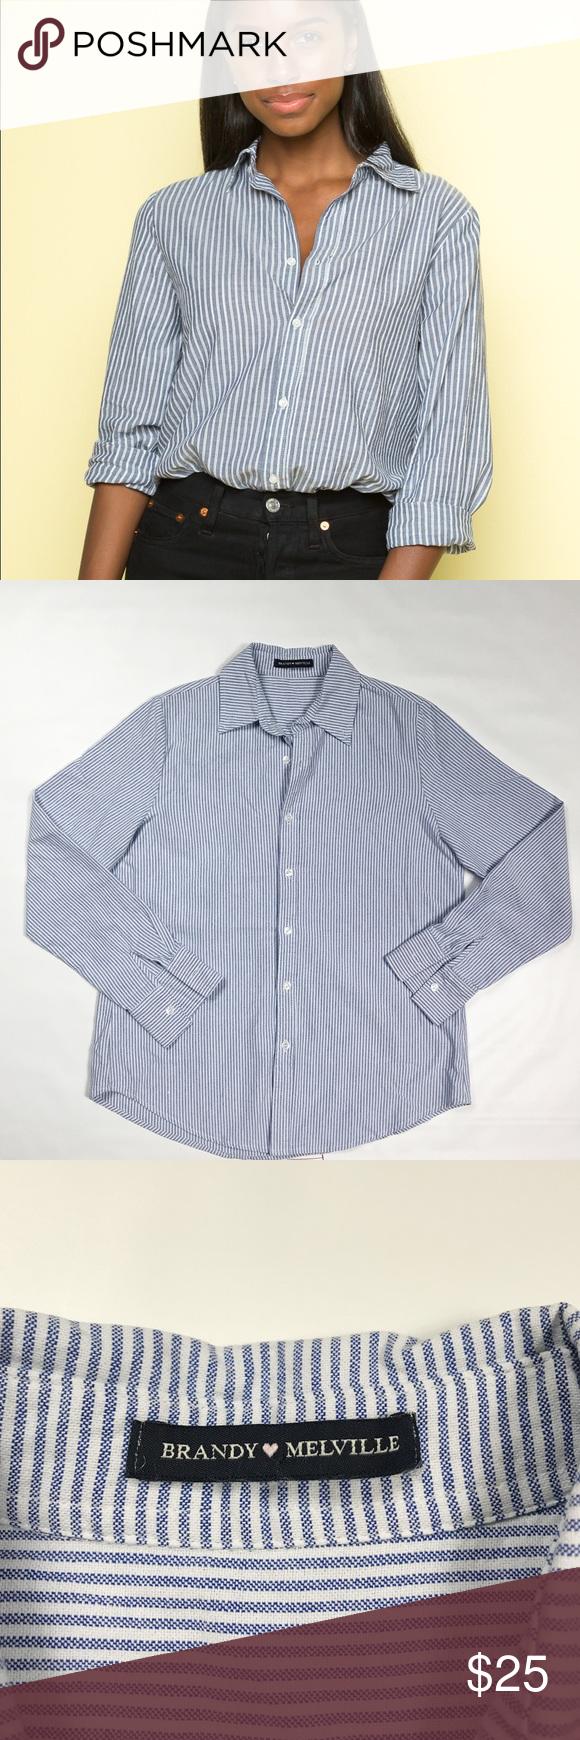 08f76b65f7959 Brandy Melville Isabela Button Down Shirt Brandy Melville